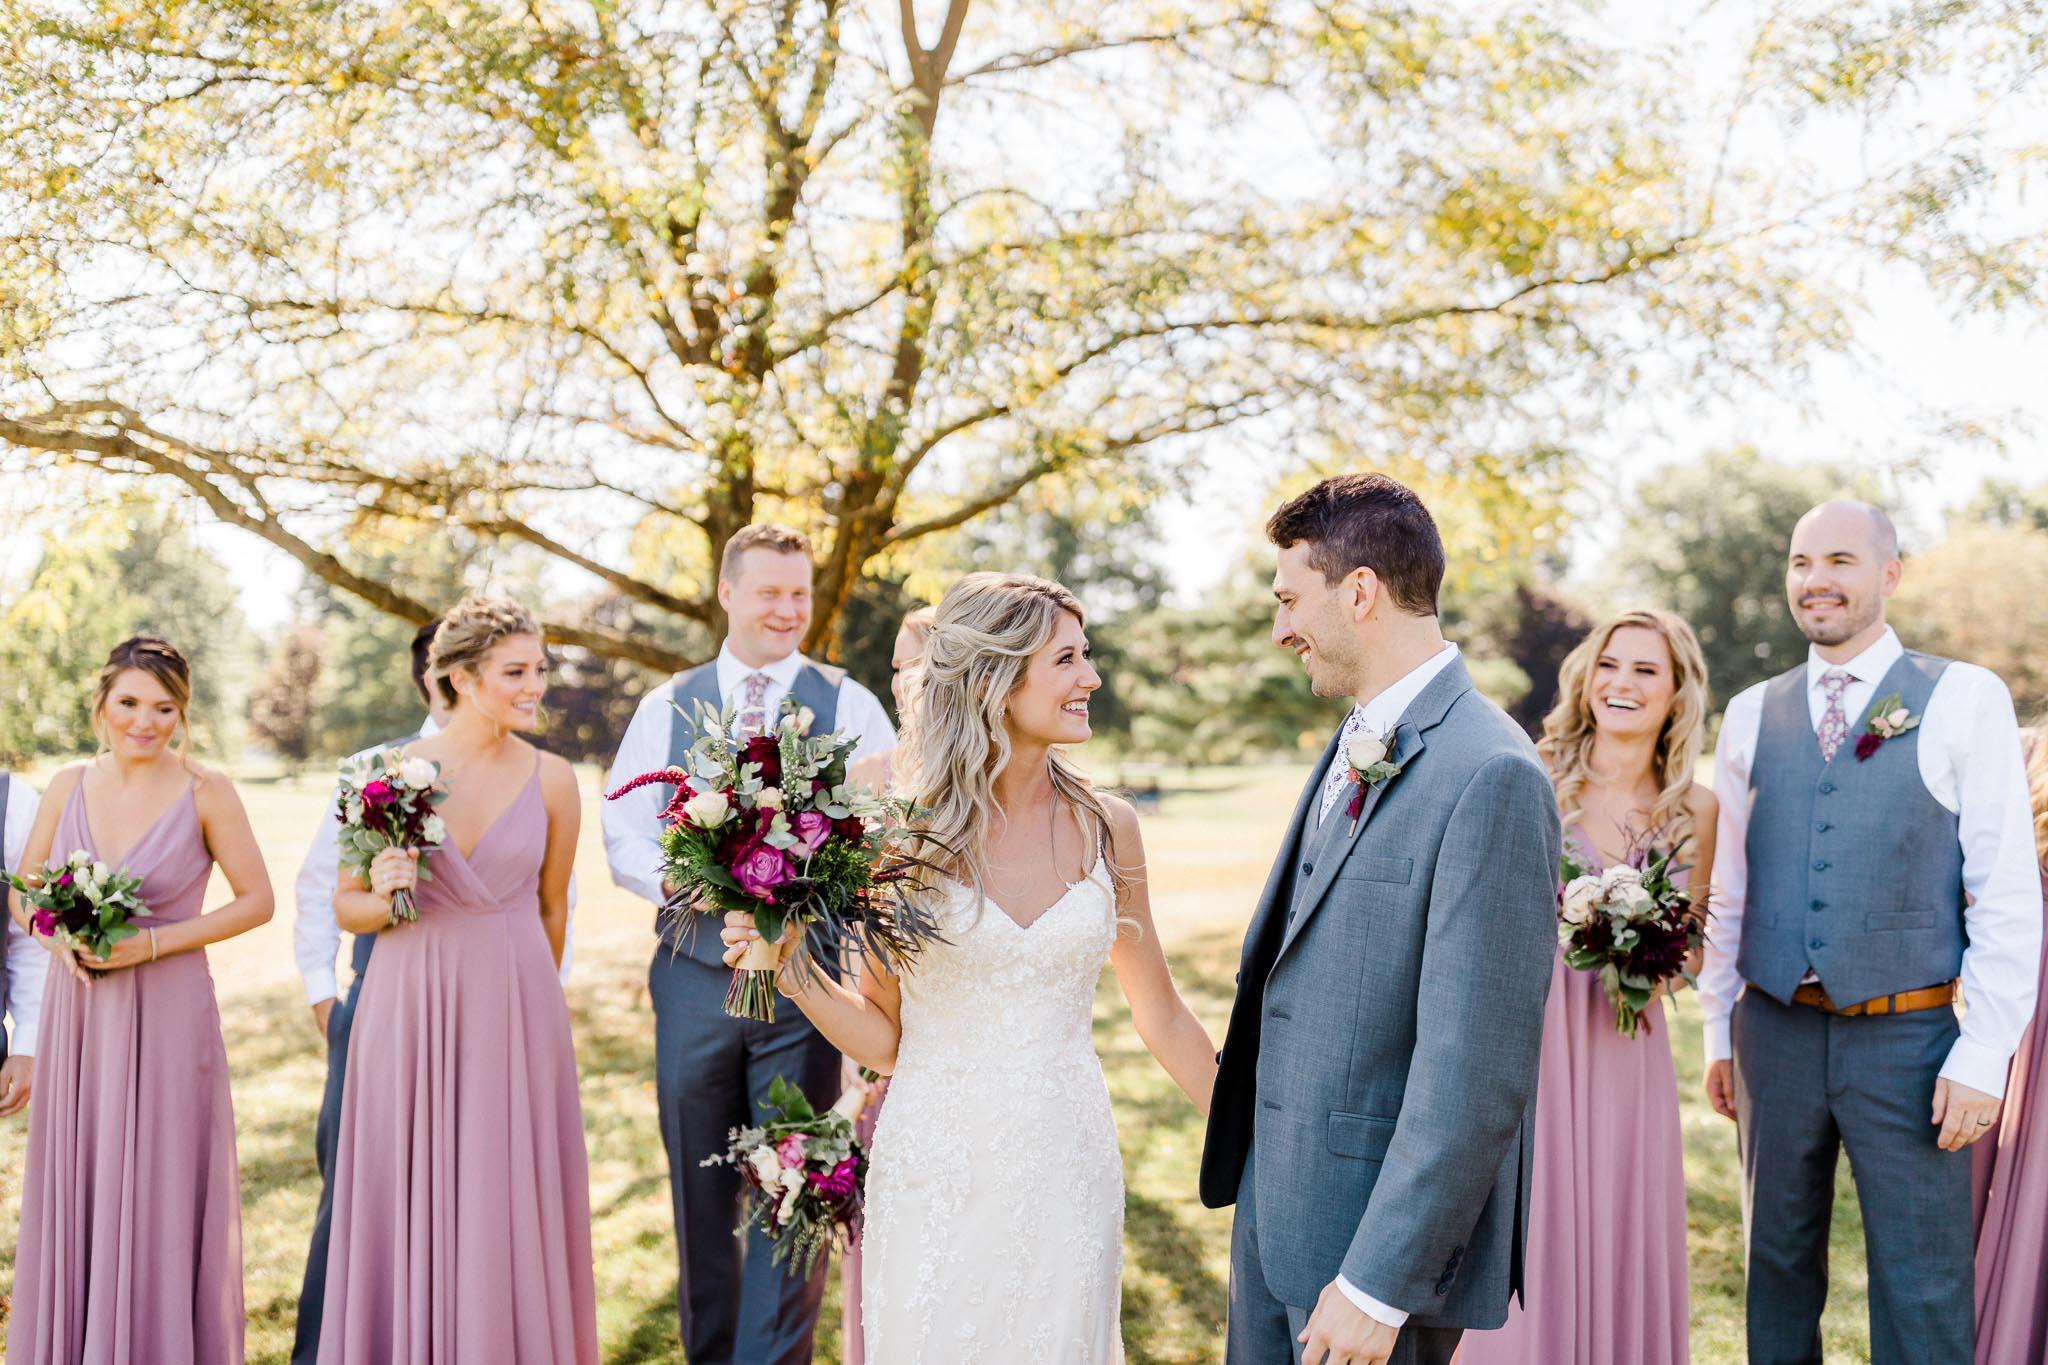 Frosty-Valley-September-Wedding-7449.jpg